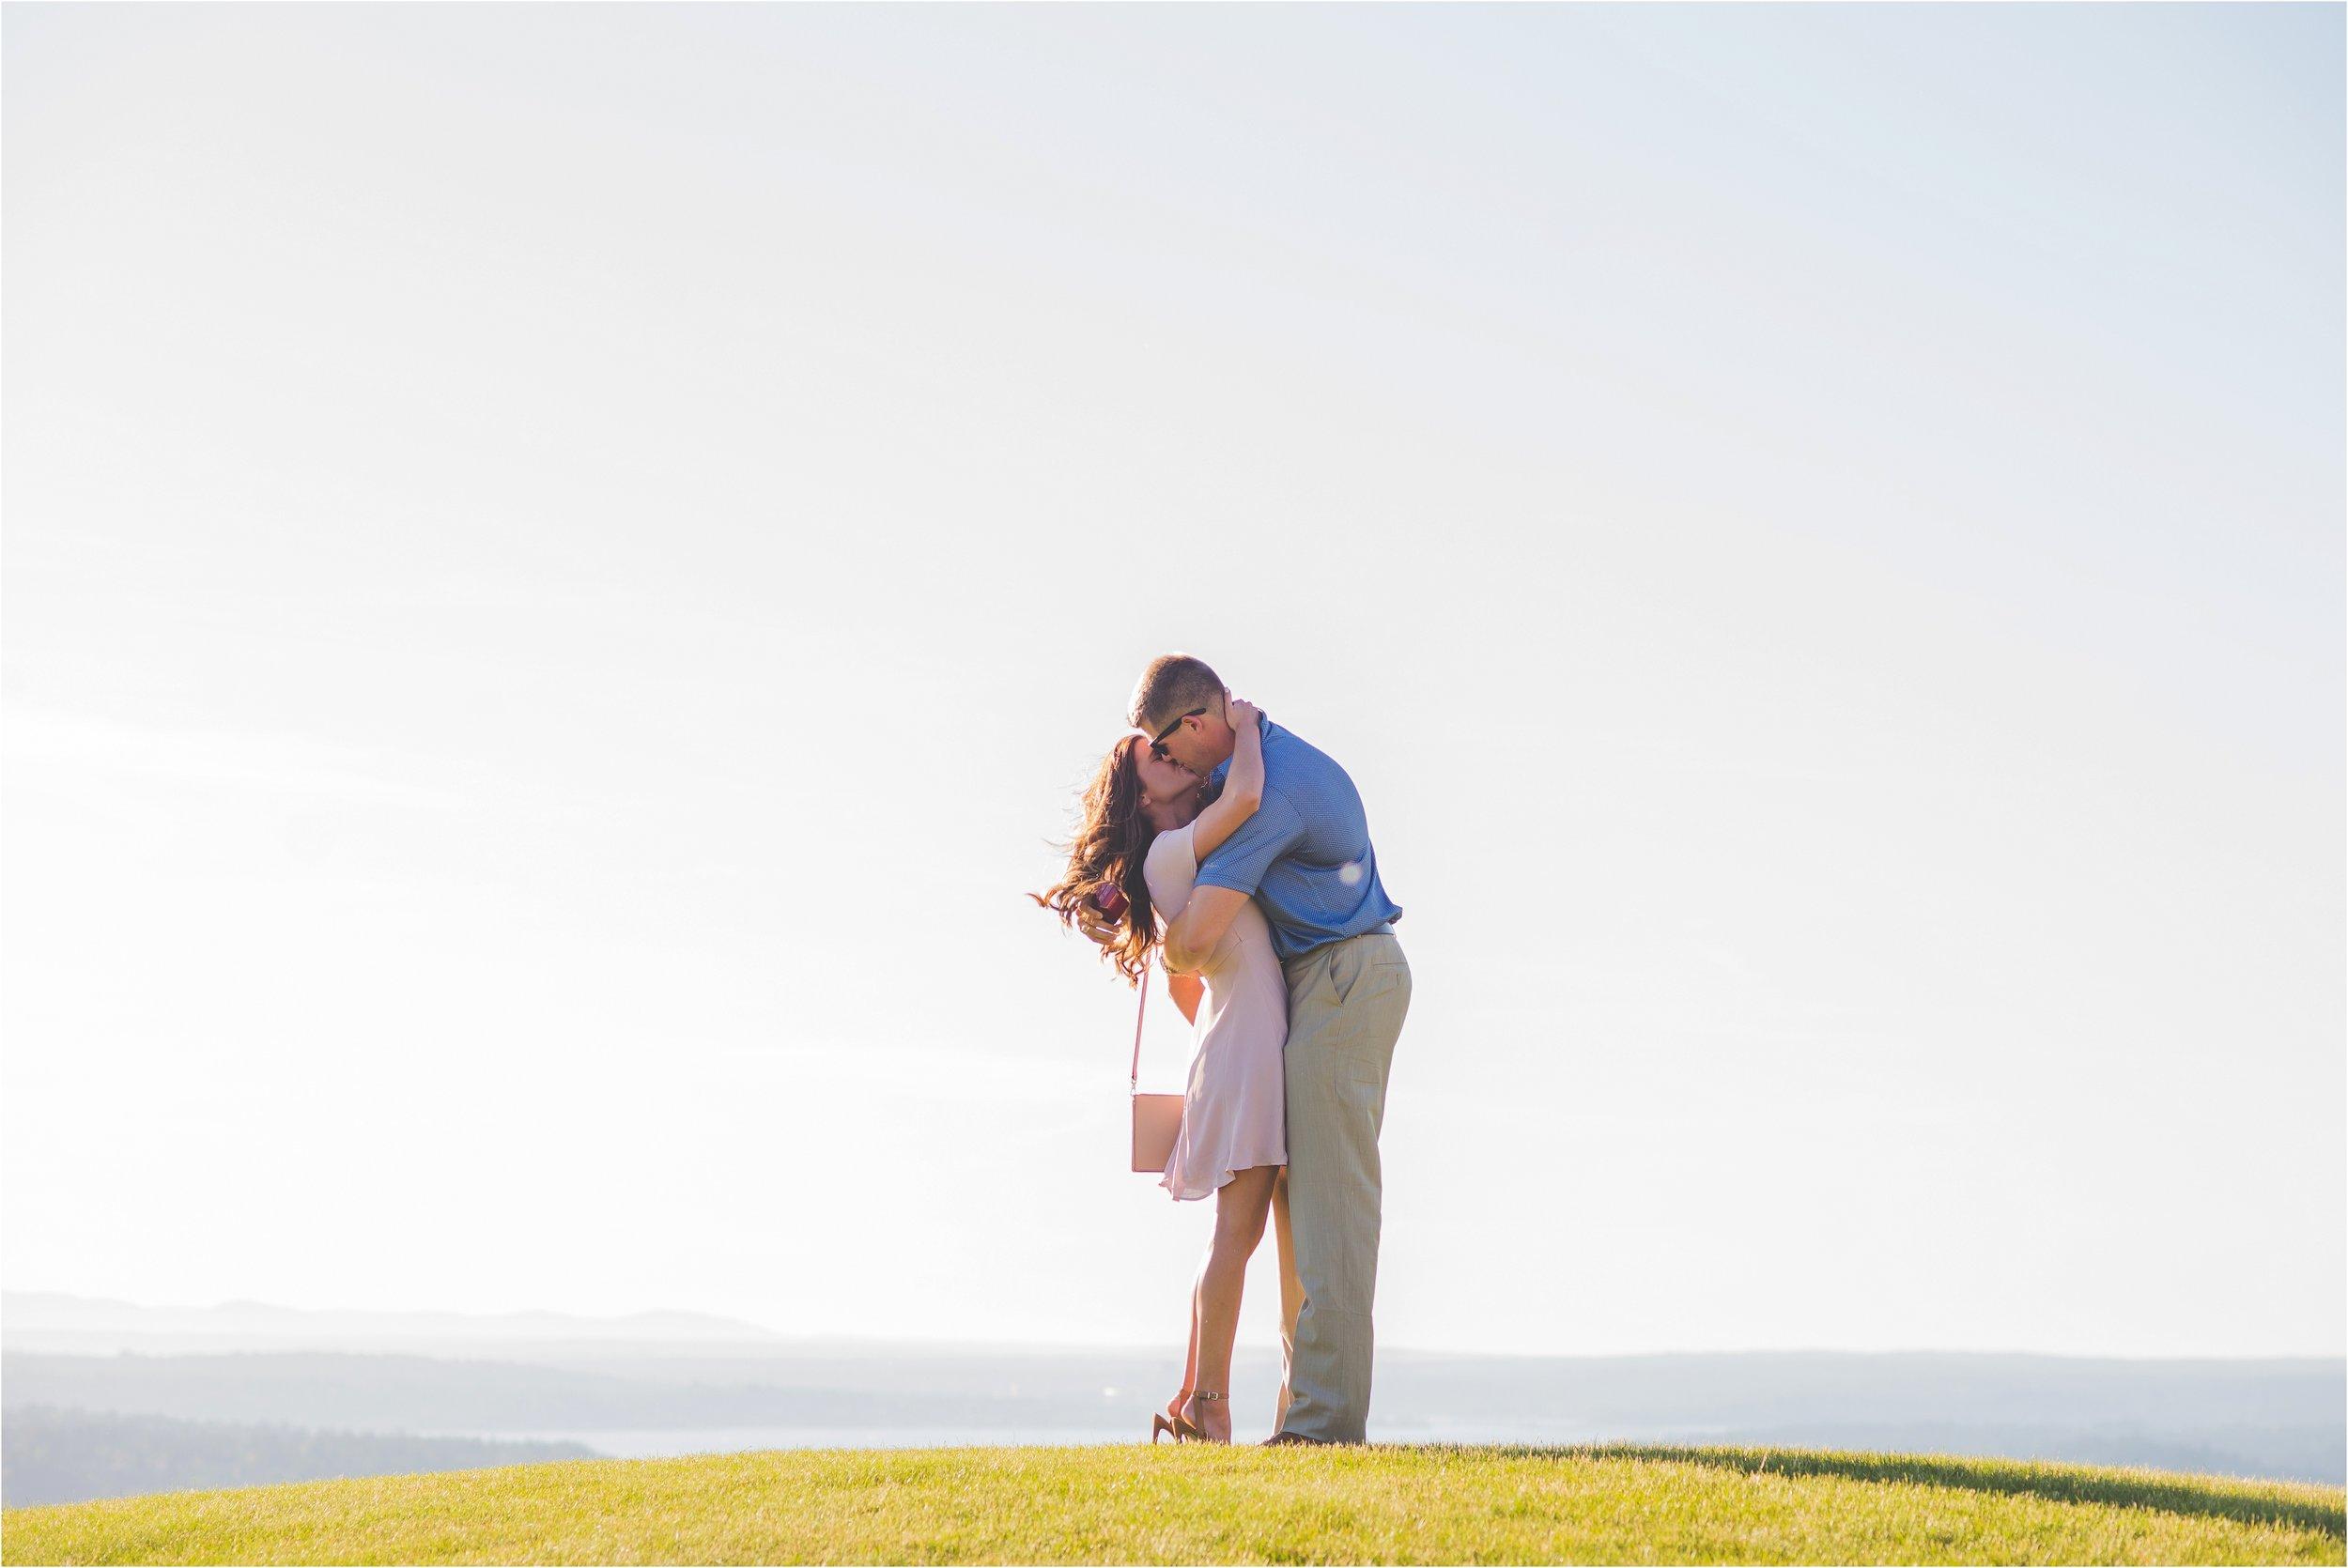 newcastle-golf-club-proposal-jannicka-mayte-seattle-washington-engagement-wedding-photographer_0009.jpg